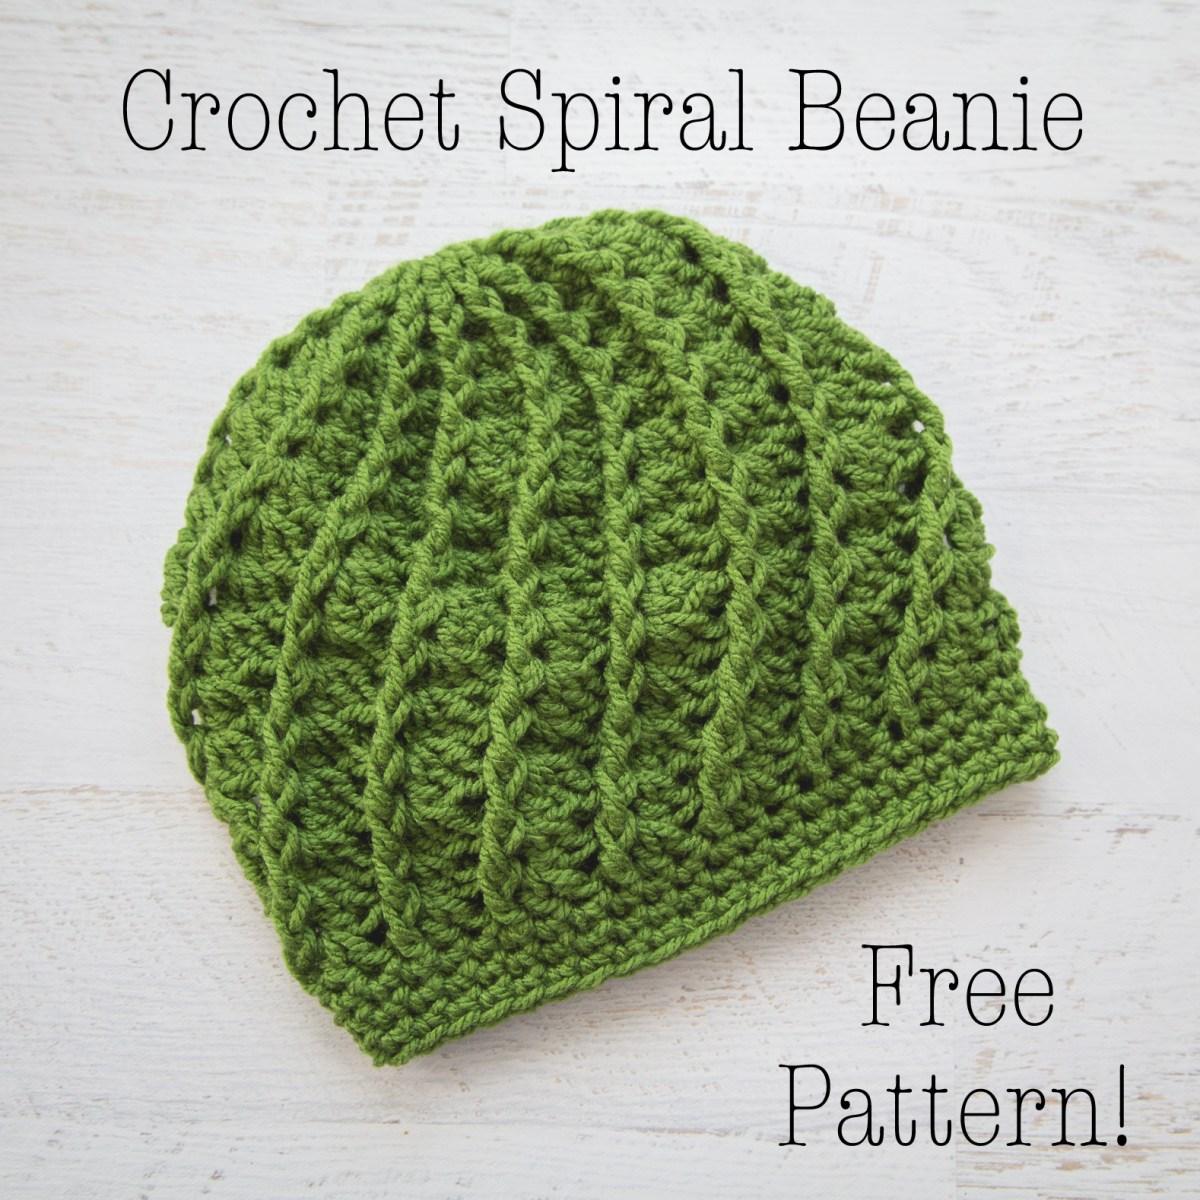 Beanie Pattern Crochet Crochet Spiral Beanie Free Crochet Pattern Loganberry Handmade